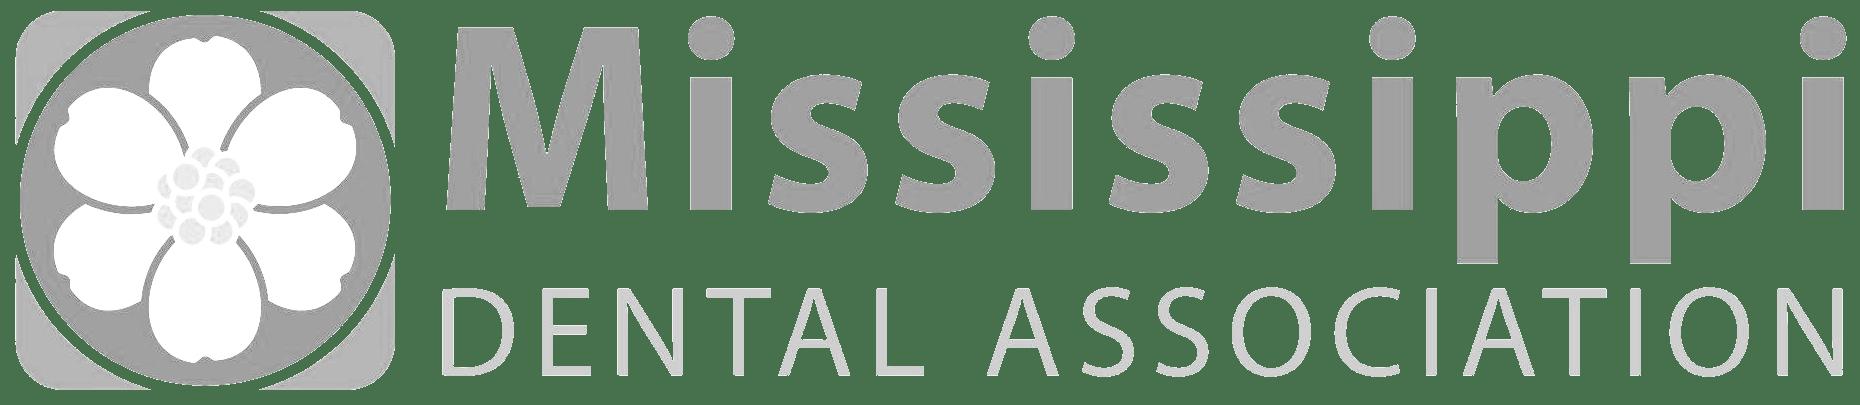 Mississippi Dental Association logo